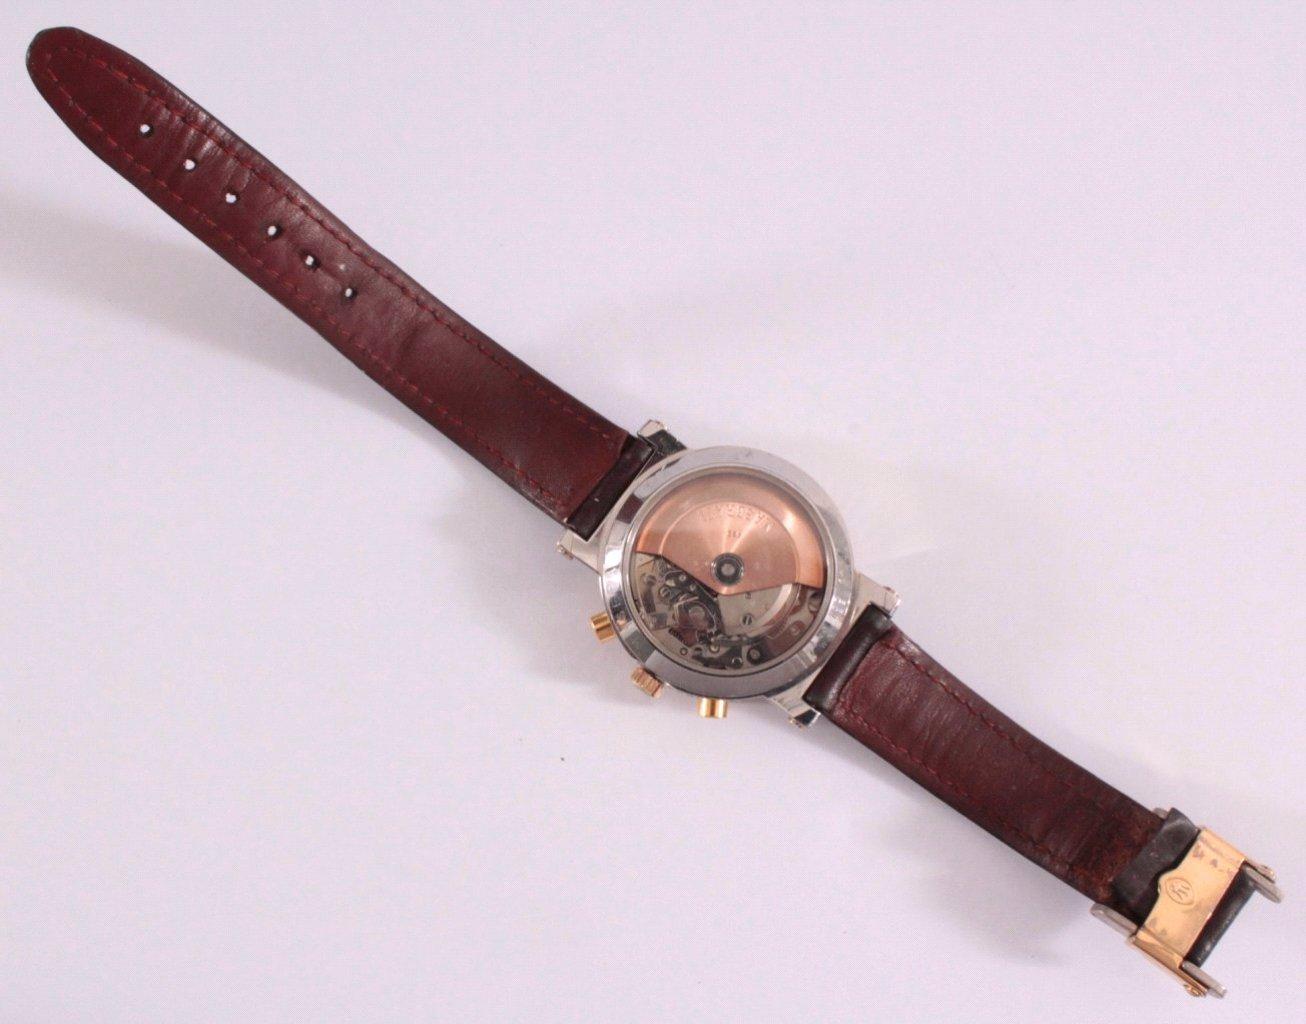 Armbanduhr Maserati Official Timepiece, Modell Karif-2